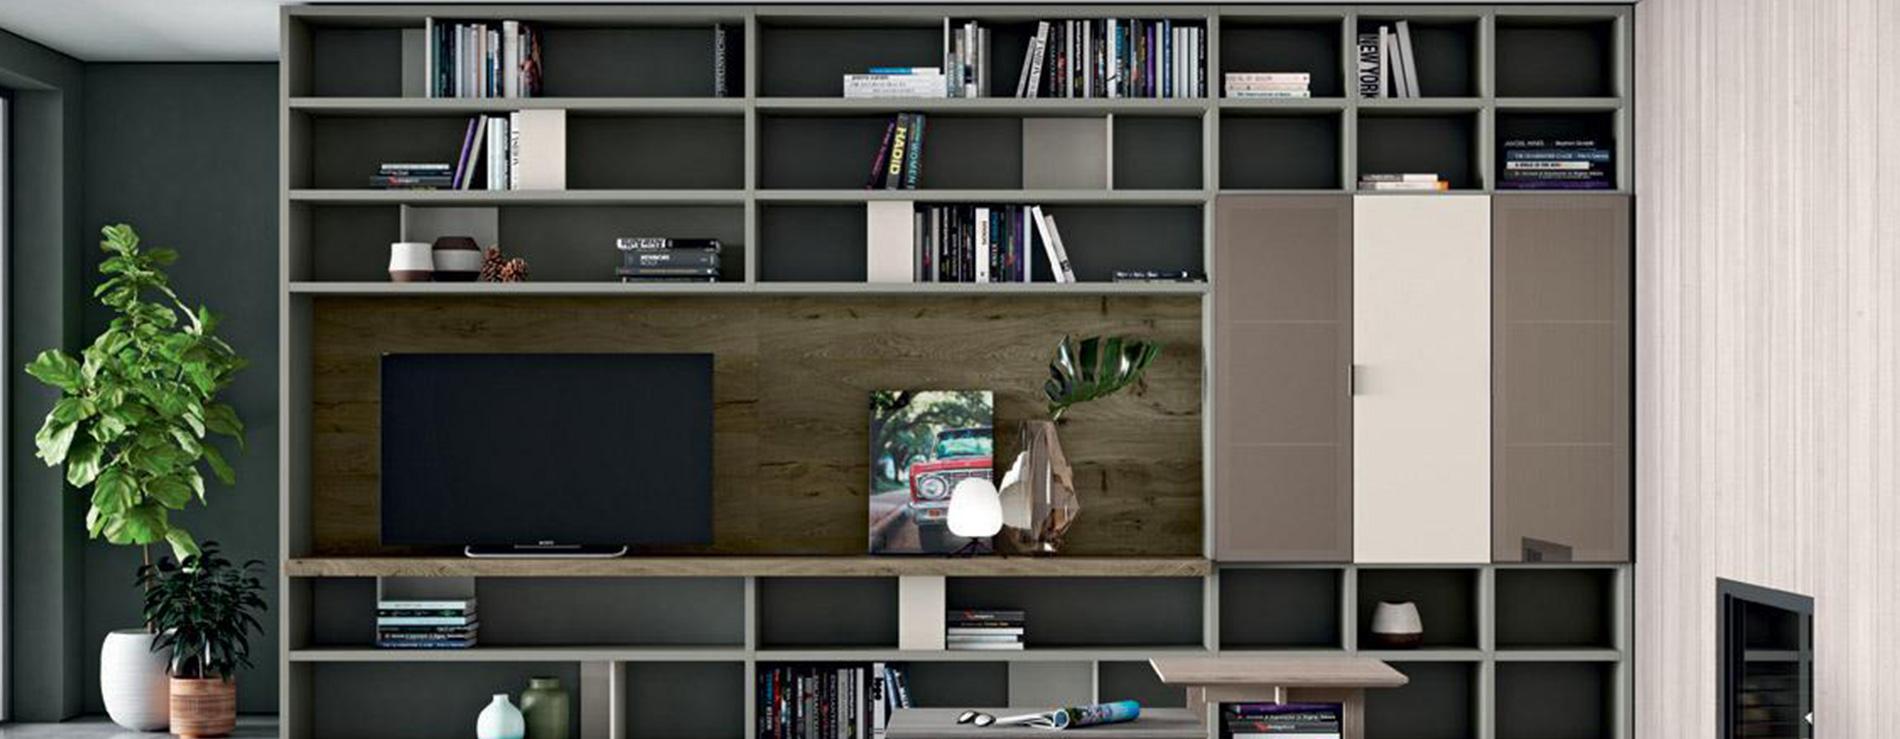 libreria parete mobilgam